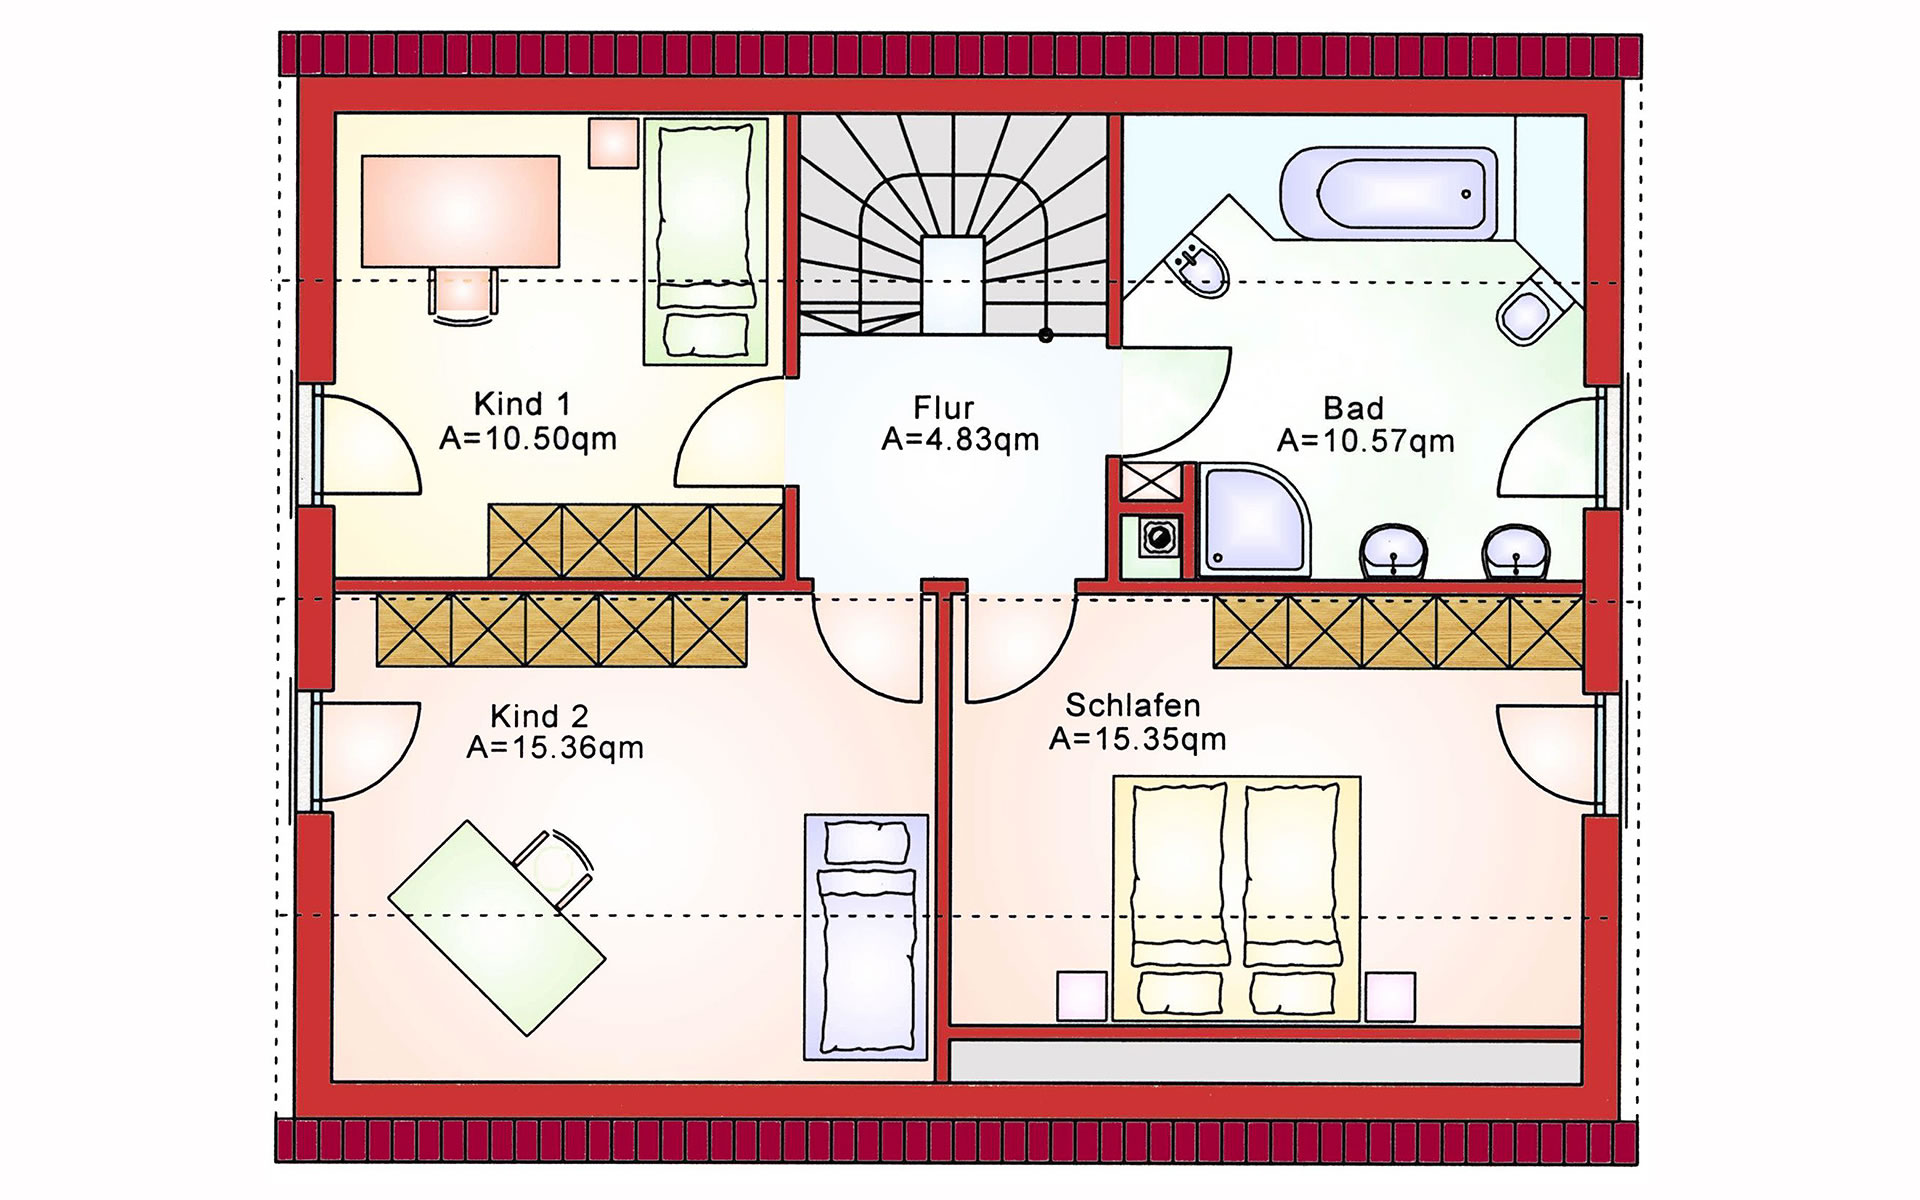 Dachgeschoss Komfort BS 125 von B&S Selbstbausysteme GmbH & Co. KG